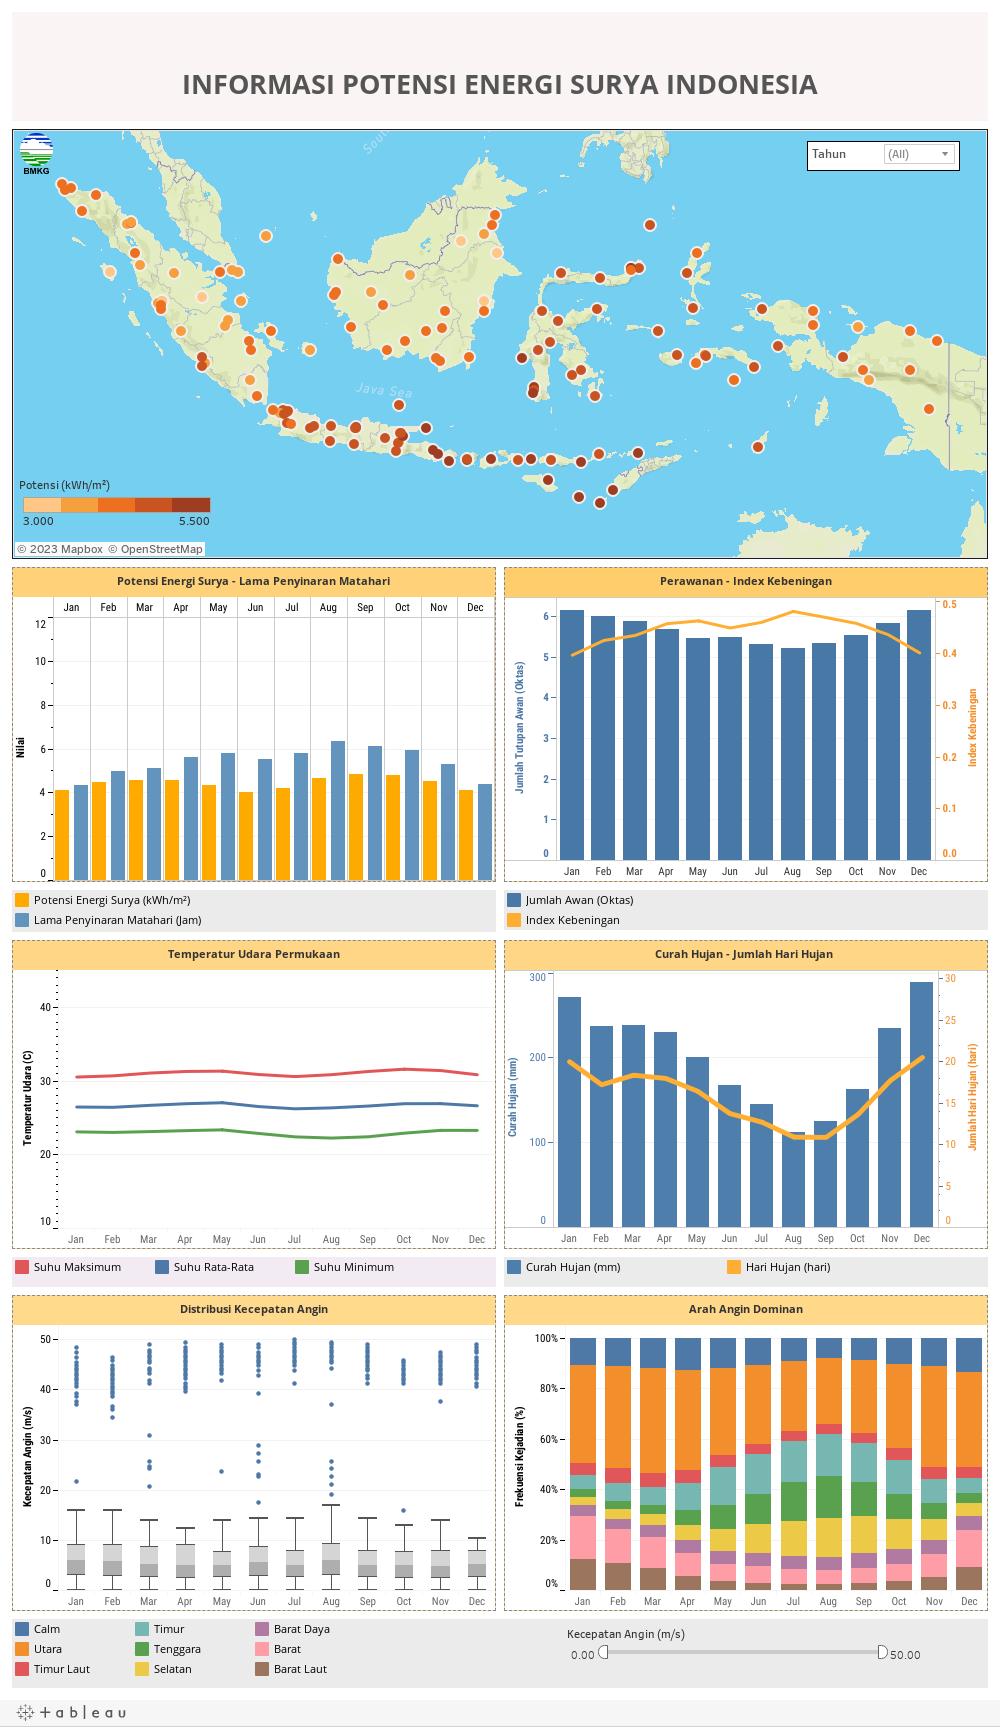 INFORMASI POTENSI ENERGI SURYA INDONESIA